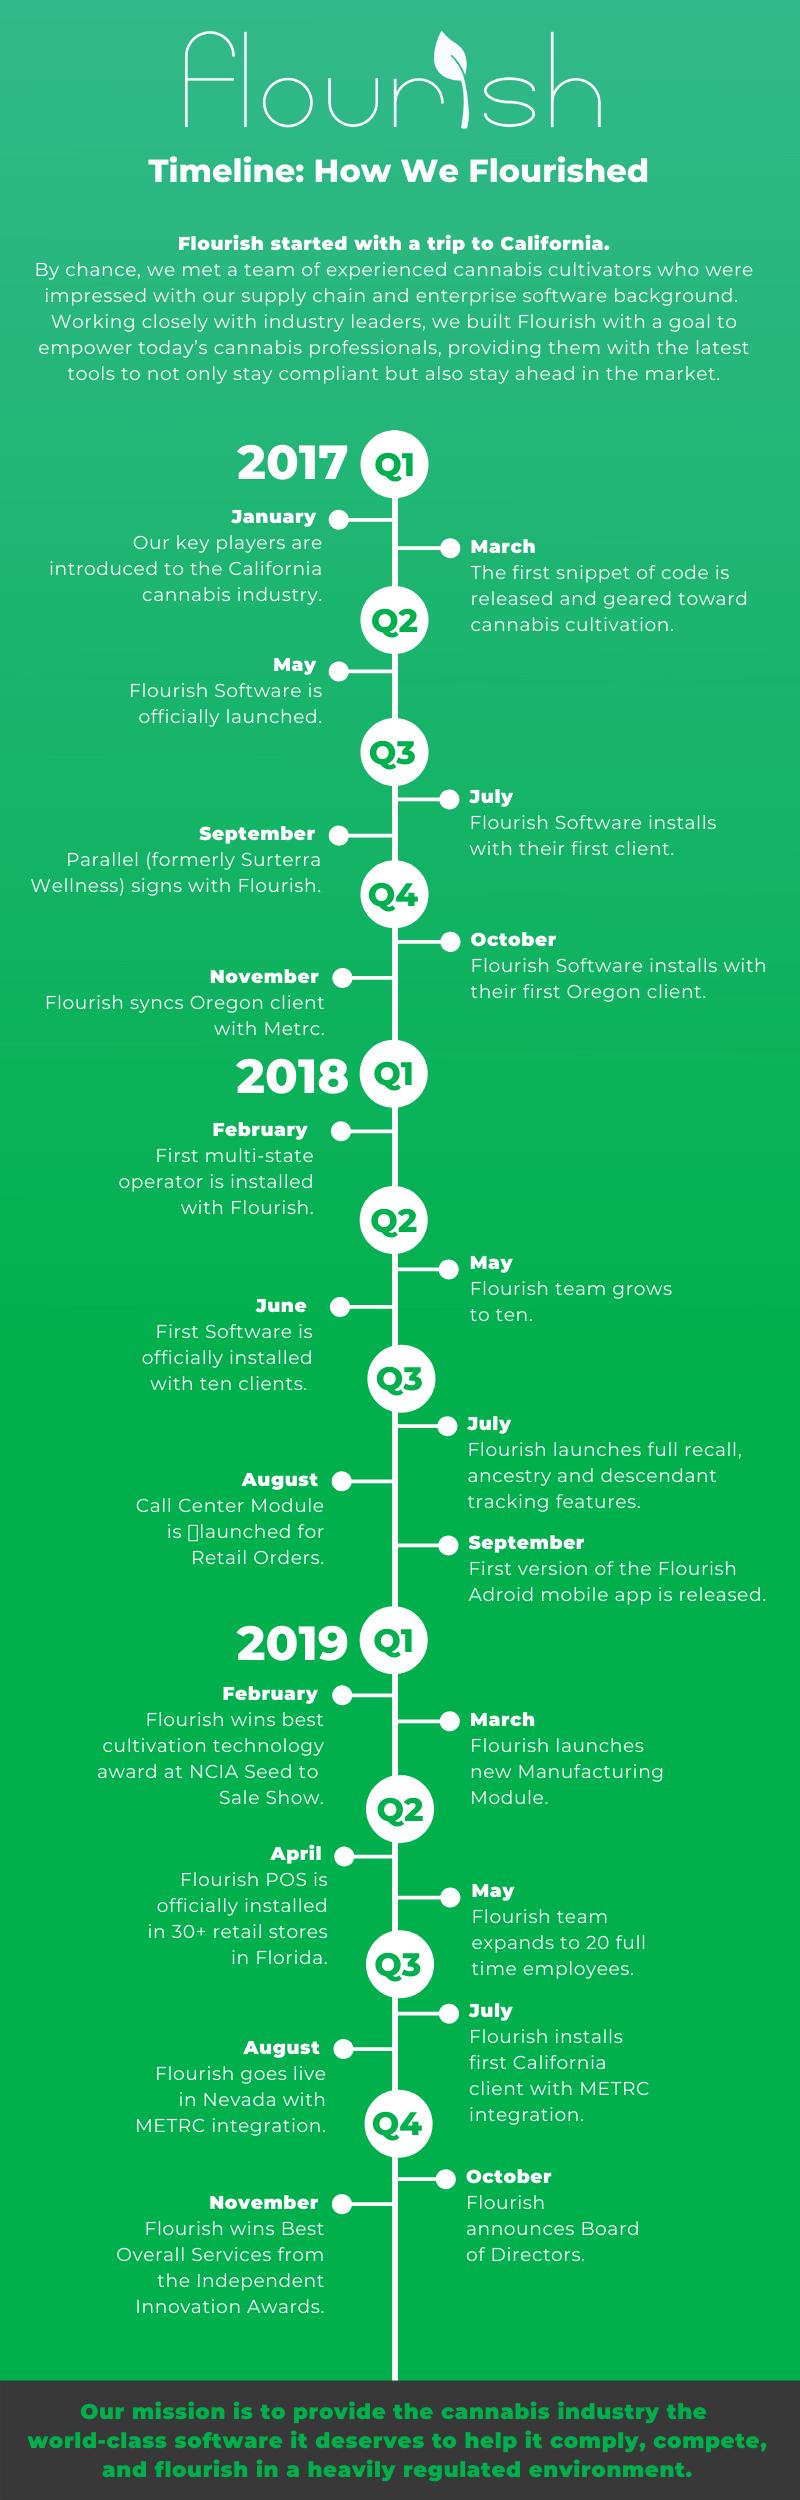 Flourish Timeline